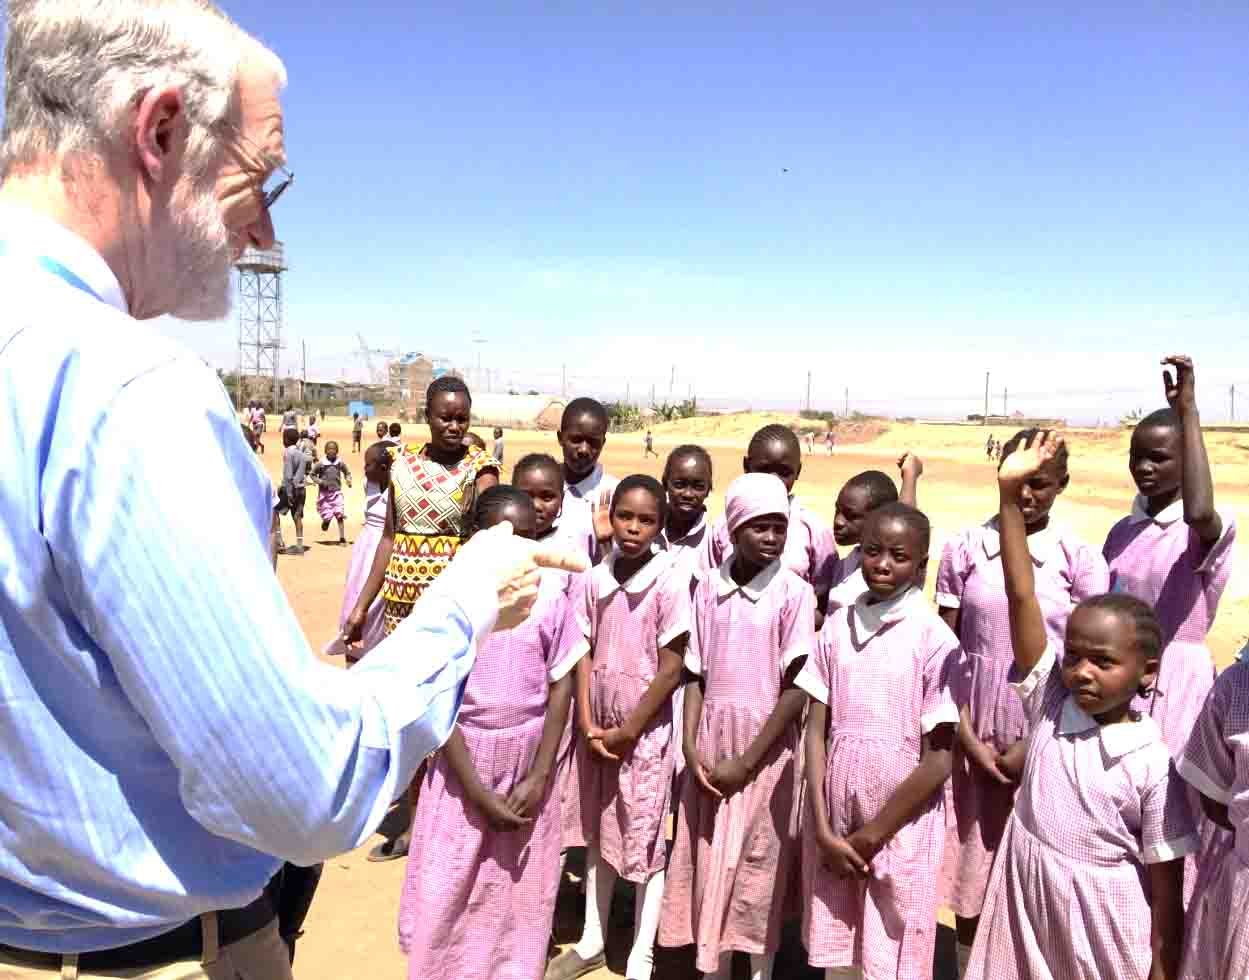 Older students at Kayole